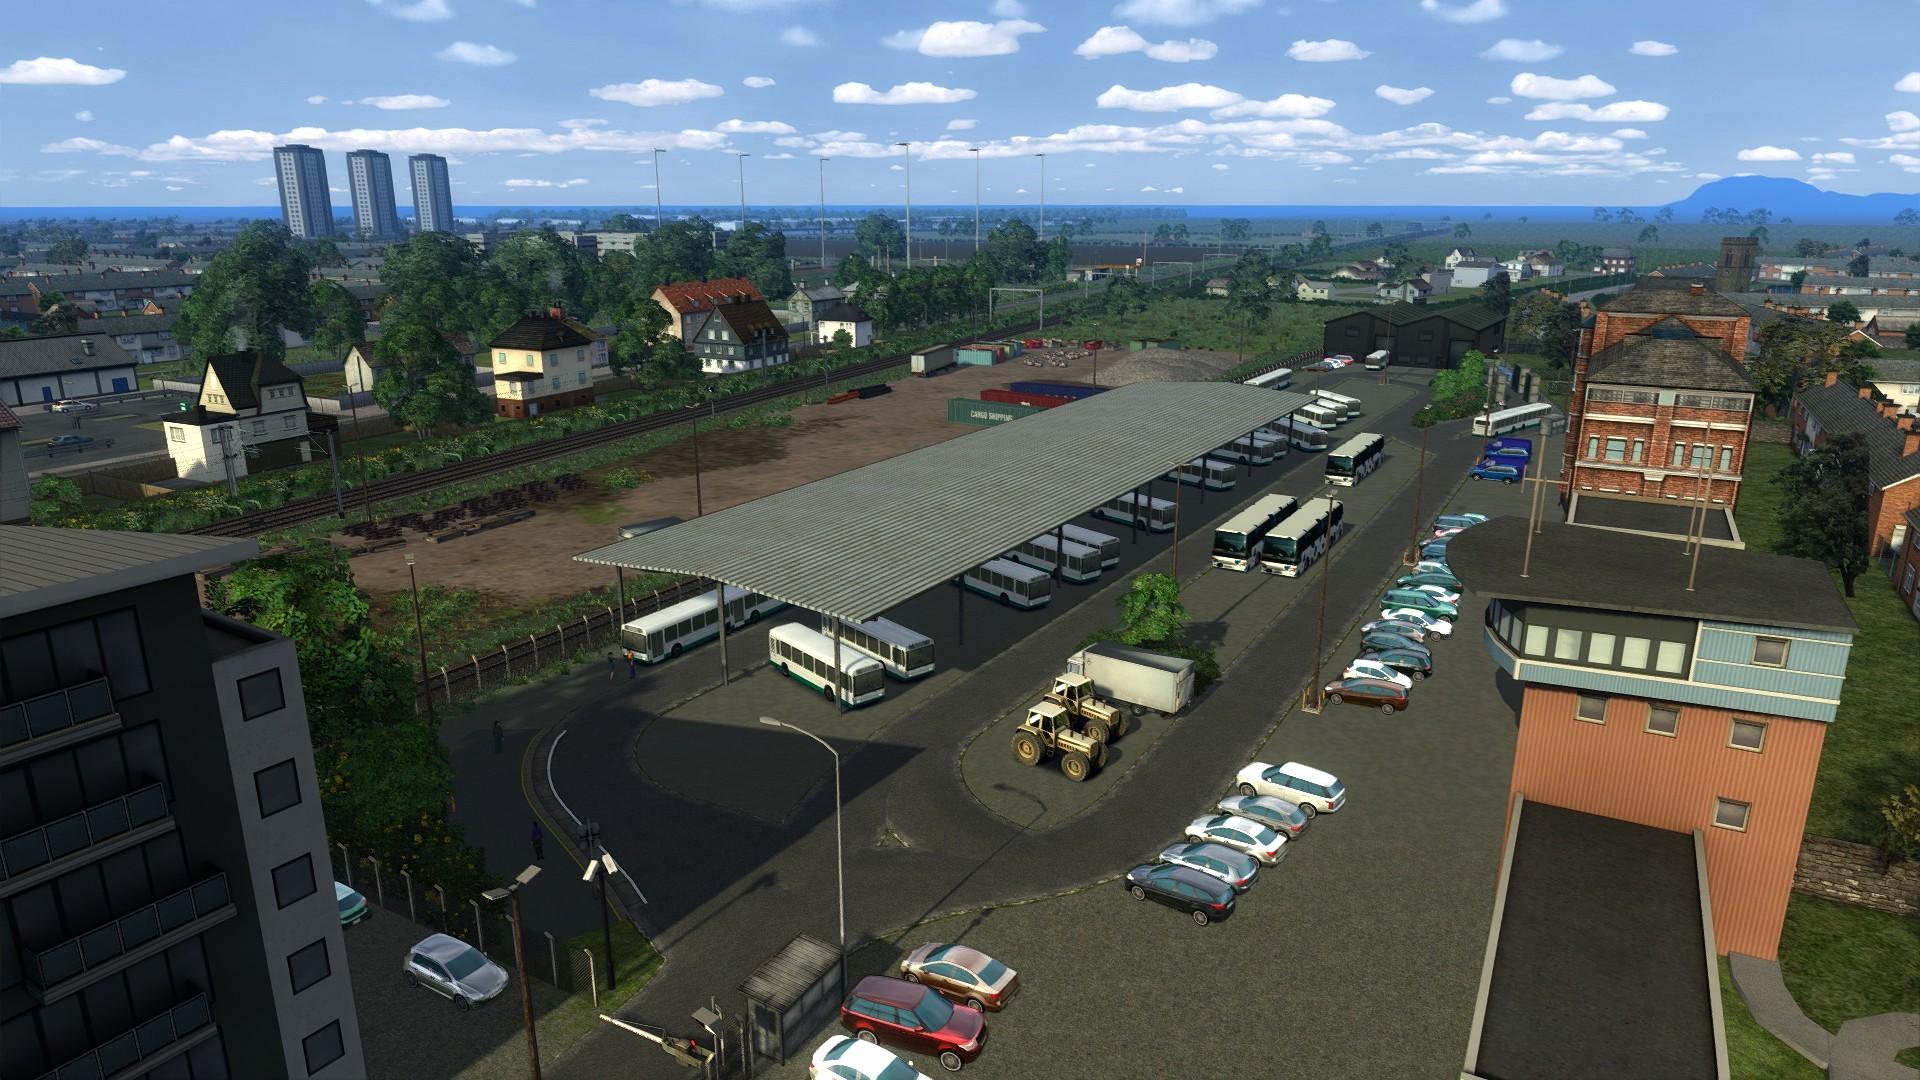 Serinathea bus depot